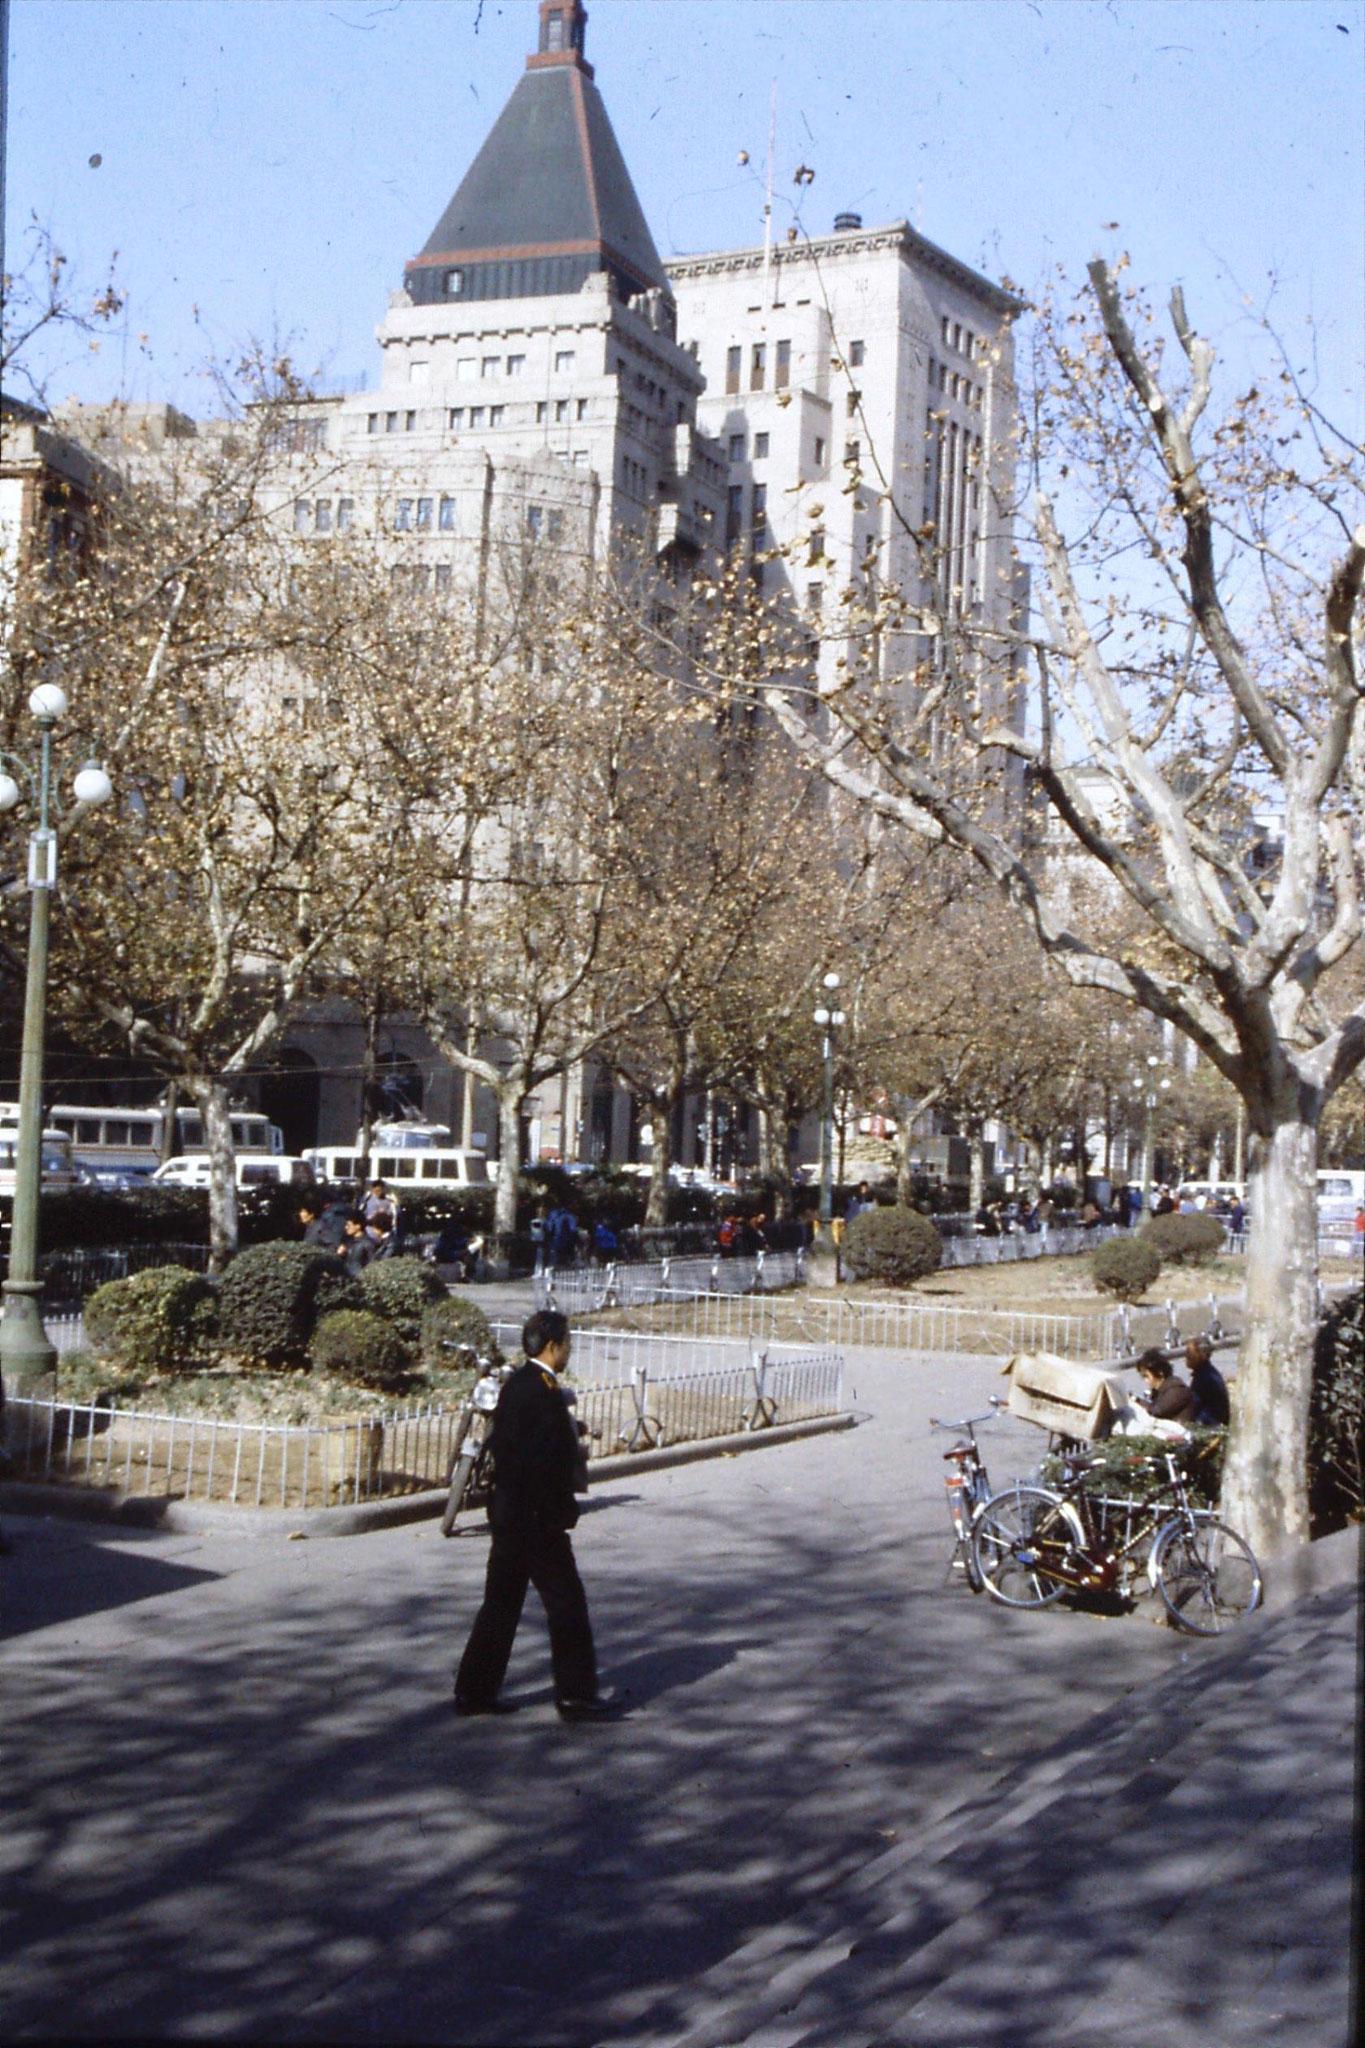 14/12/1988: 10: Shanghai peace hotel